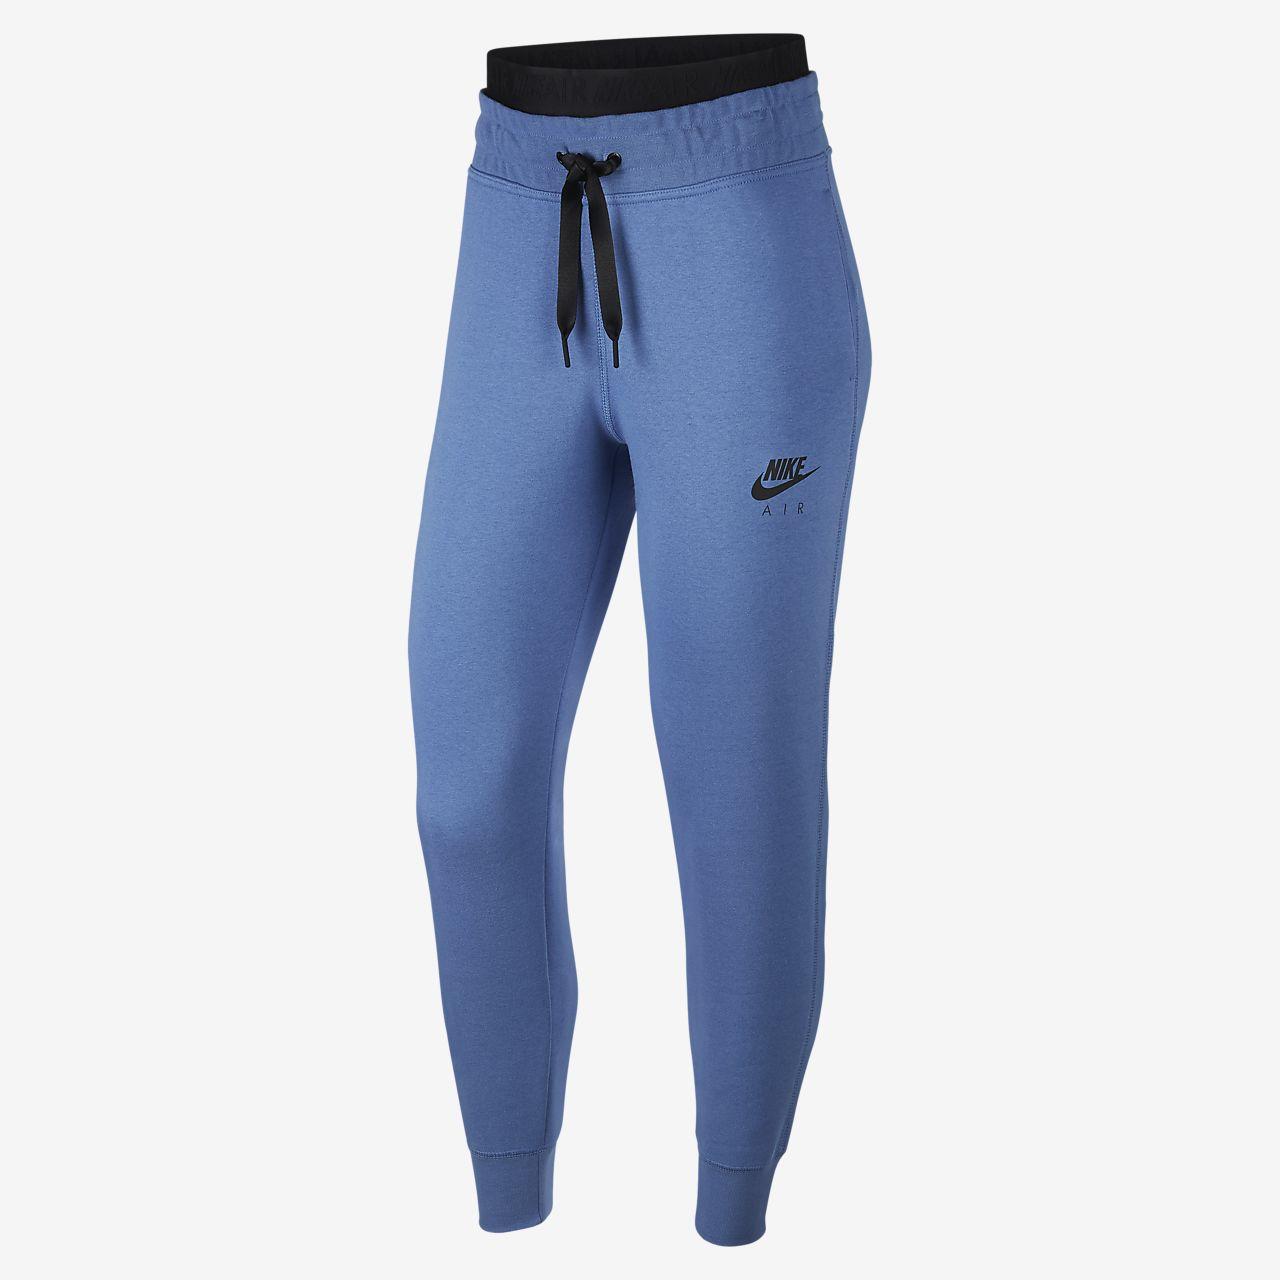 Nike Air Pantalón de tejido Fleece - Mujer